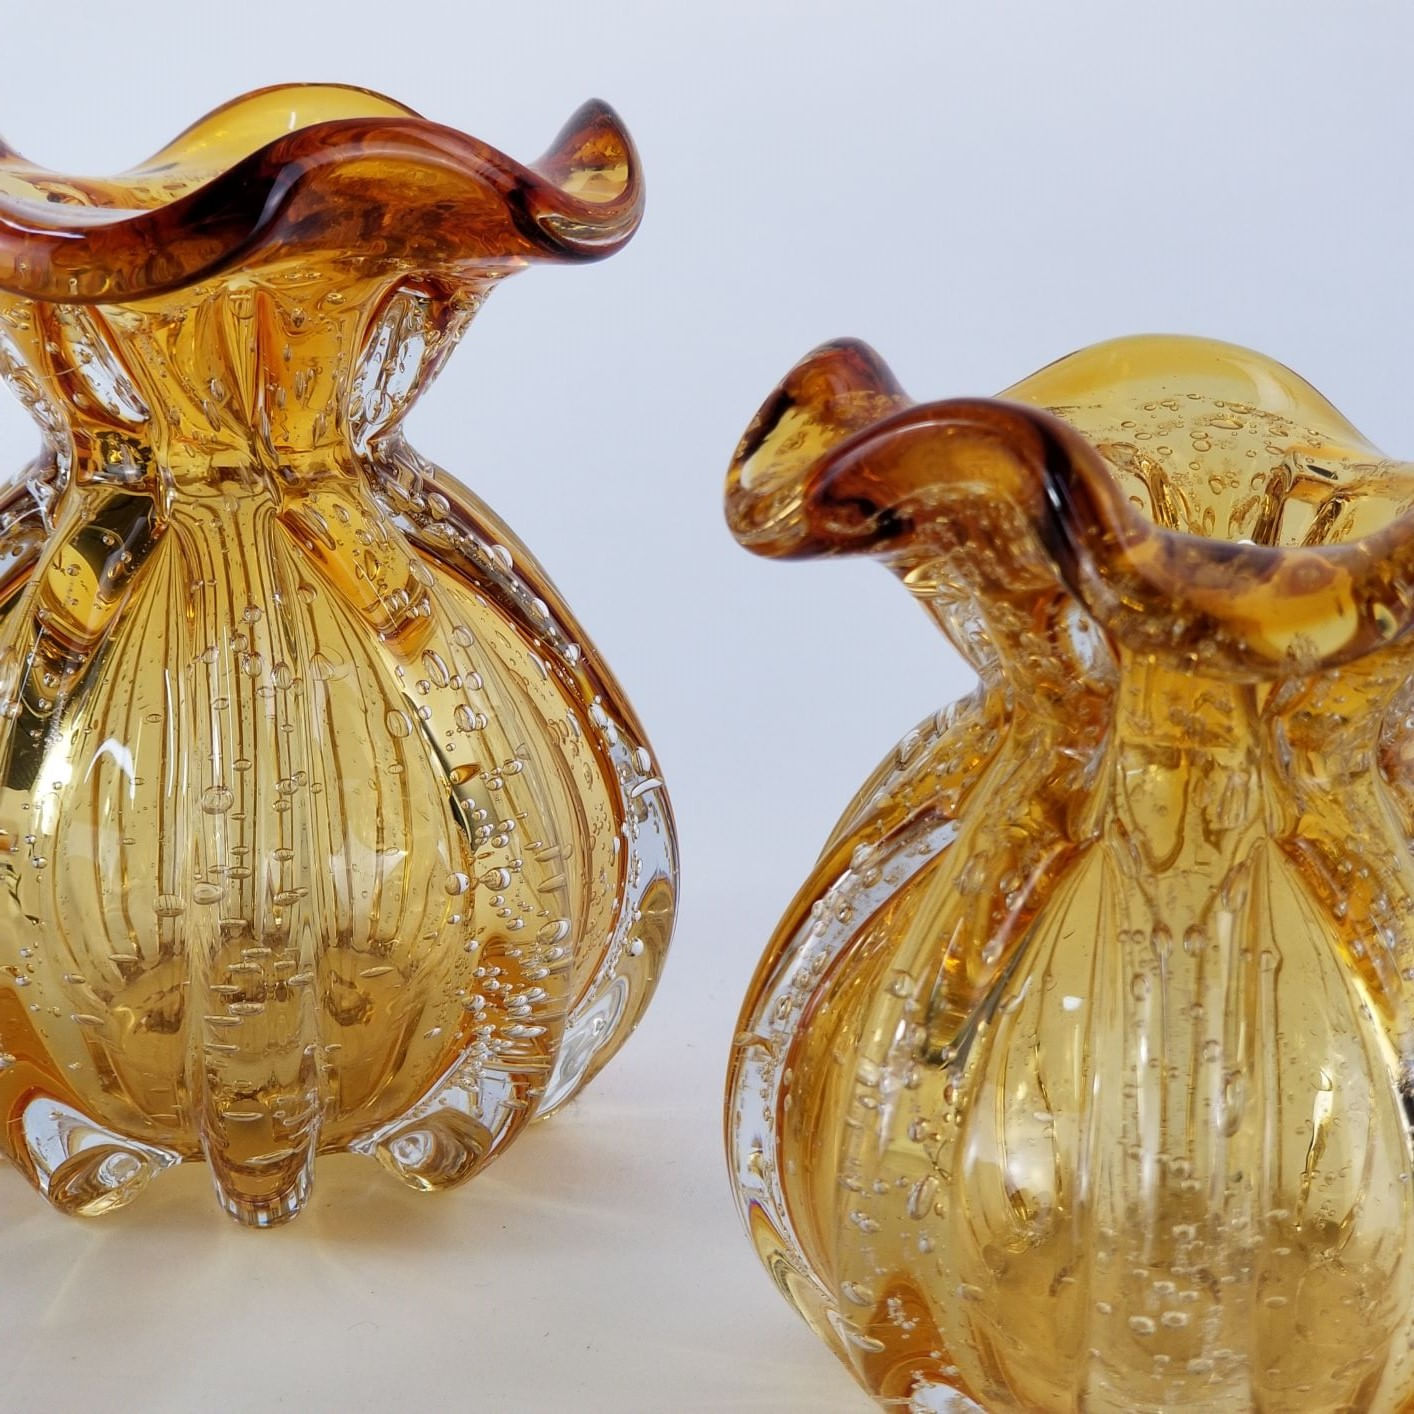 Kit Vasos de Murano - Trouxinhas Decorativas Âmbar (2 Peças)